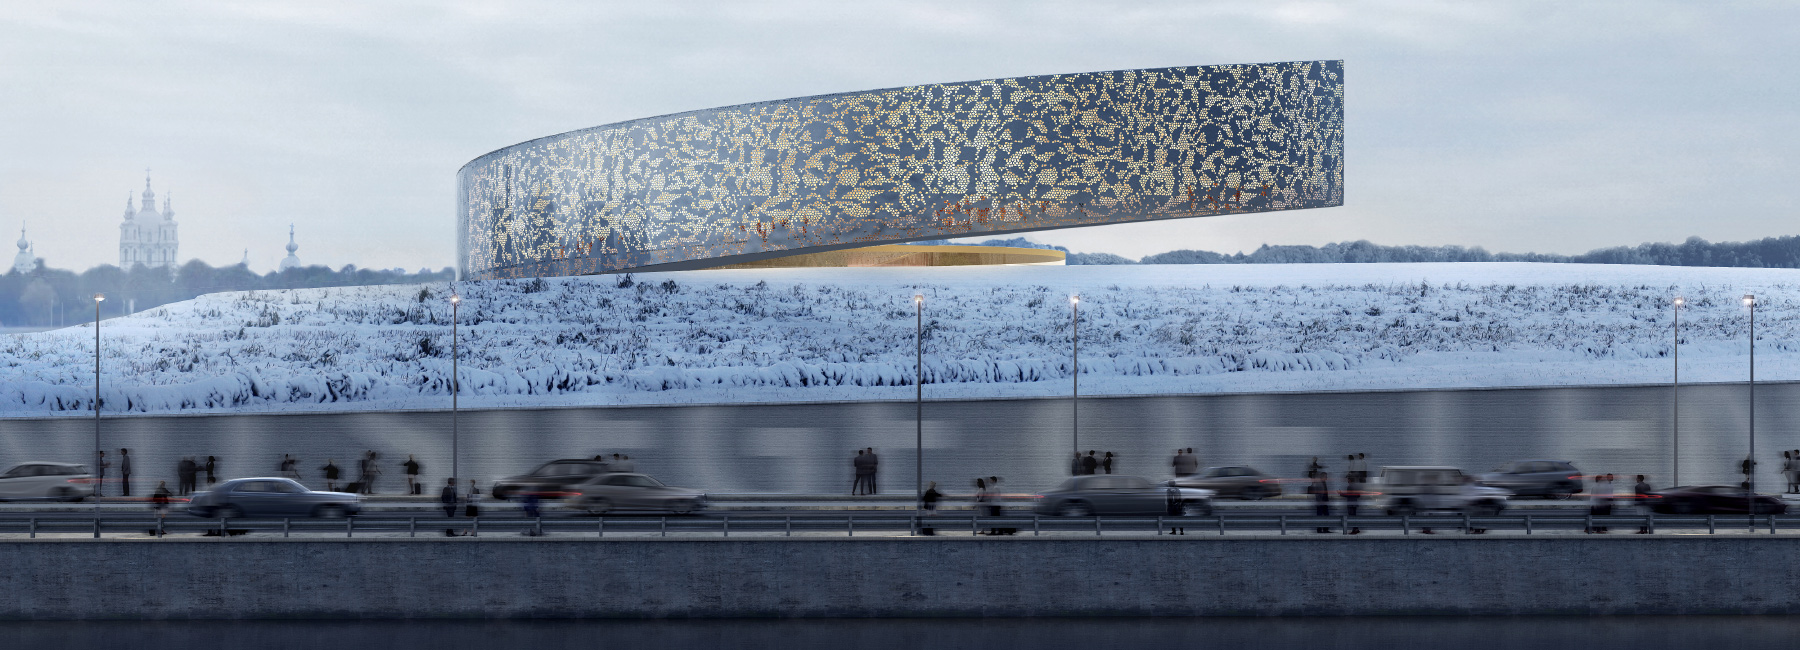 interview: lahdelma & mahlamaki architects on projects ...